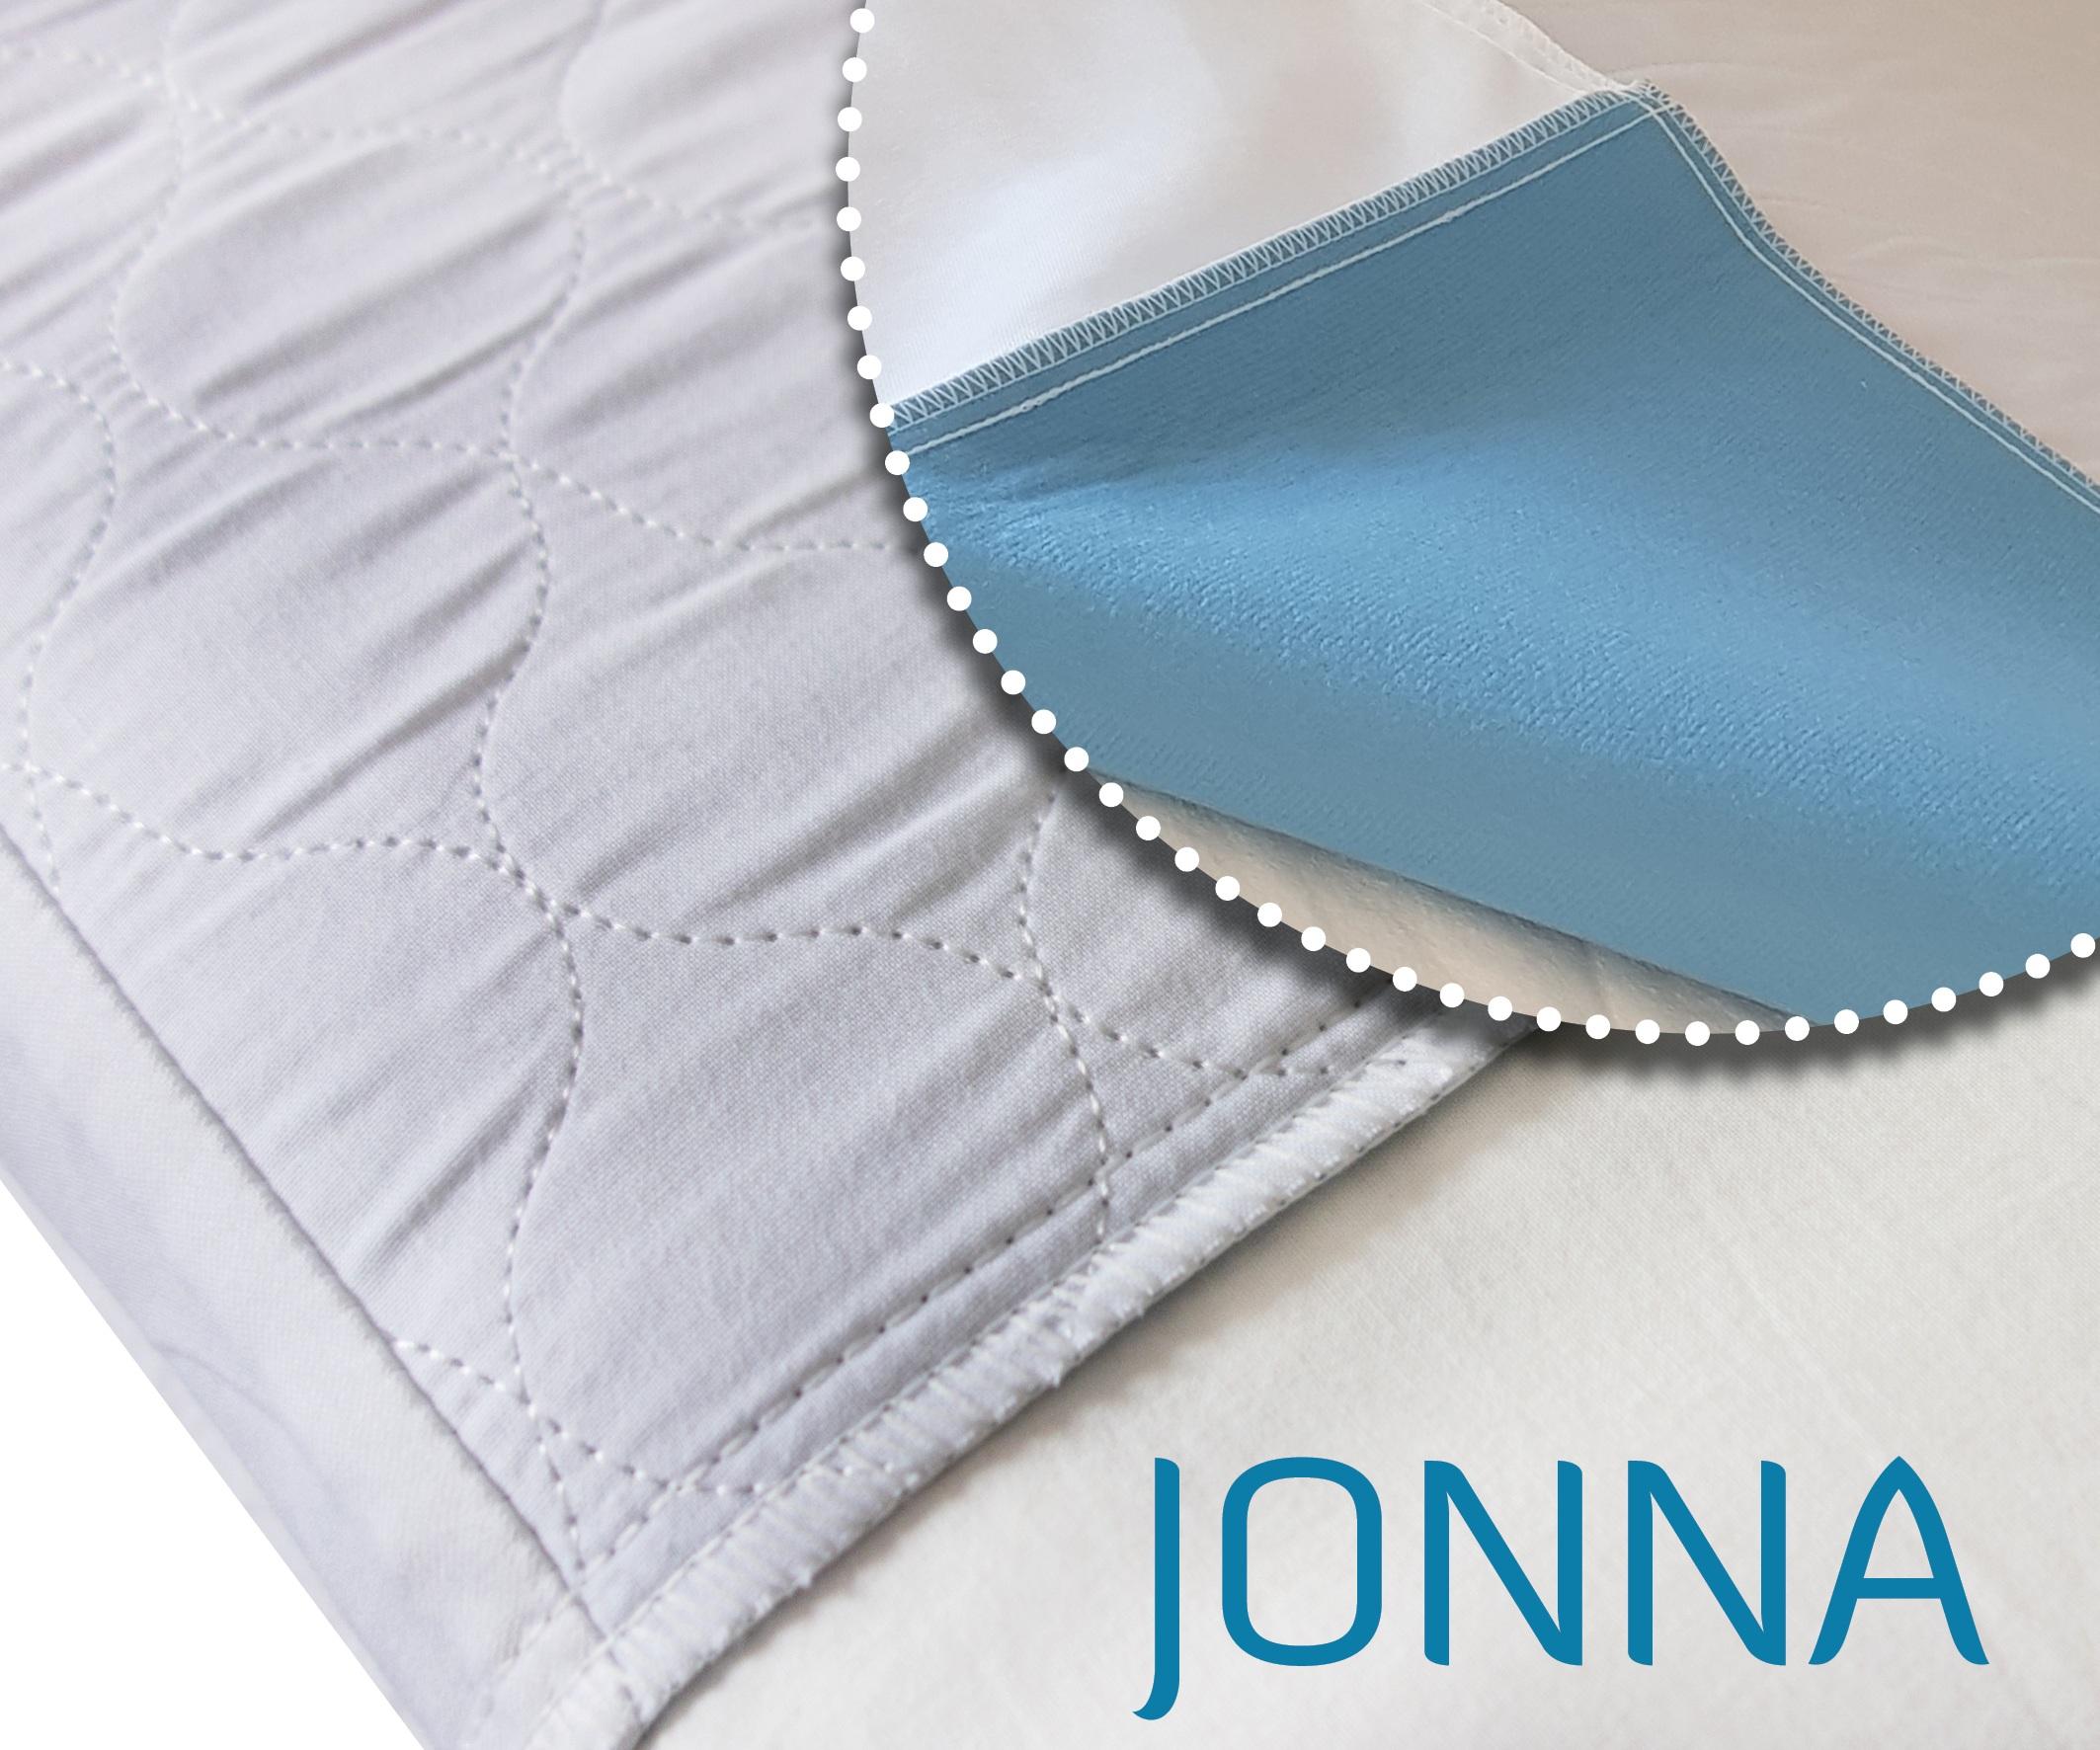 1105277 OneMed_ProSense Lakansskydd JONNA_60002